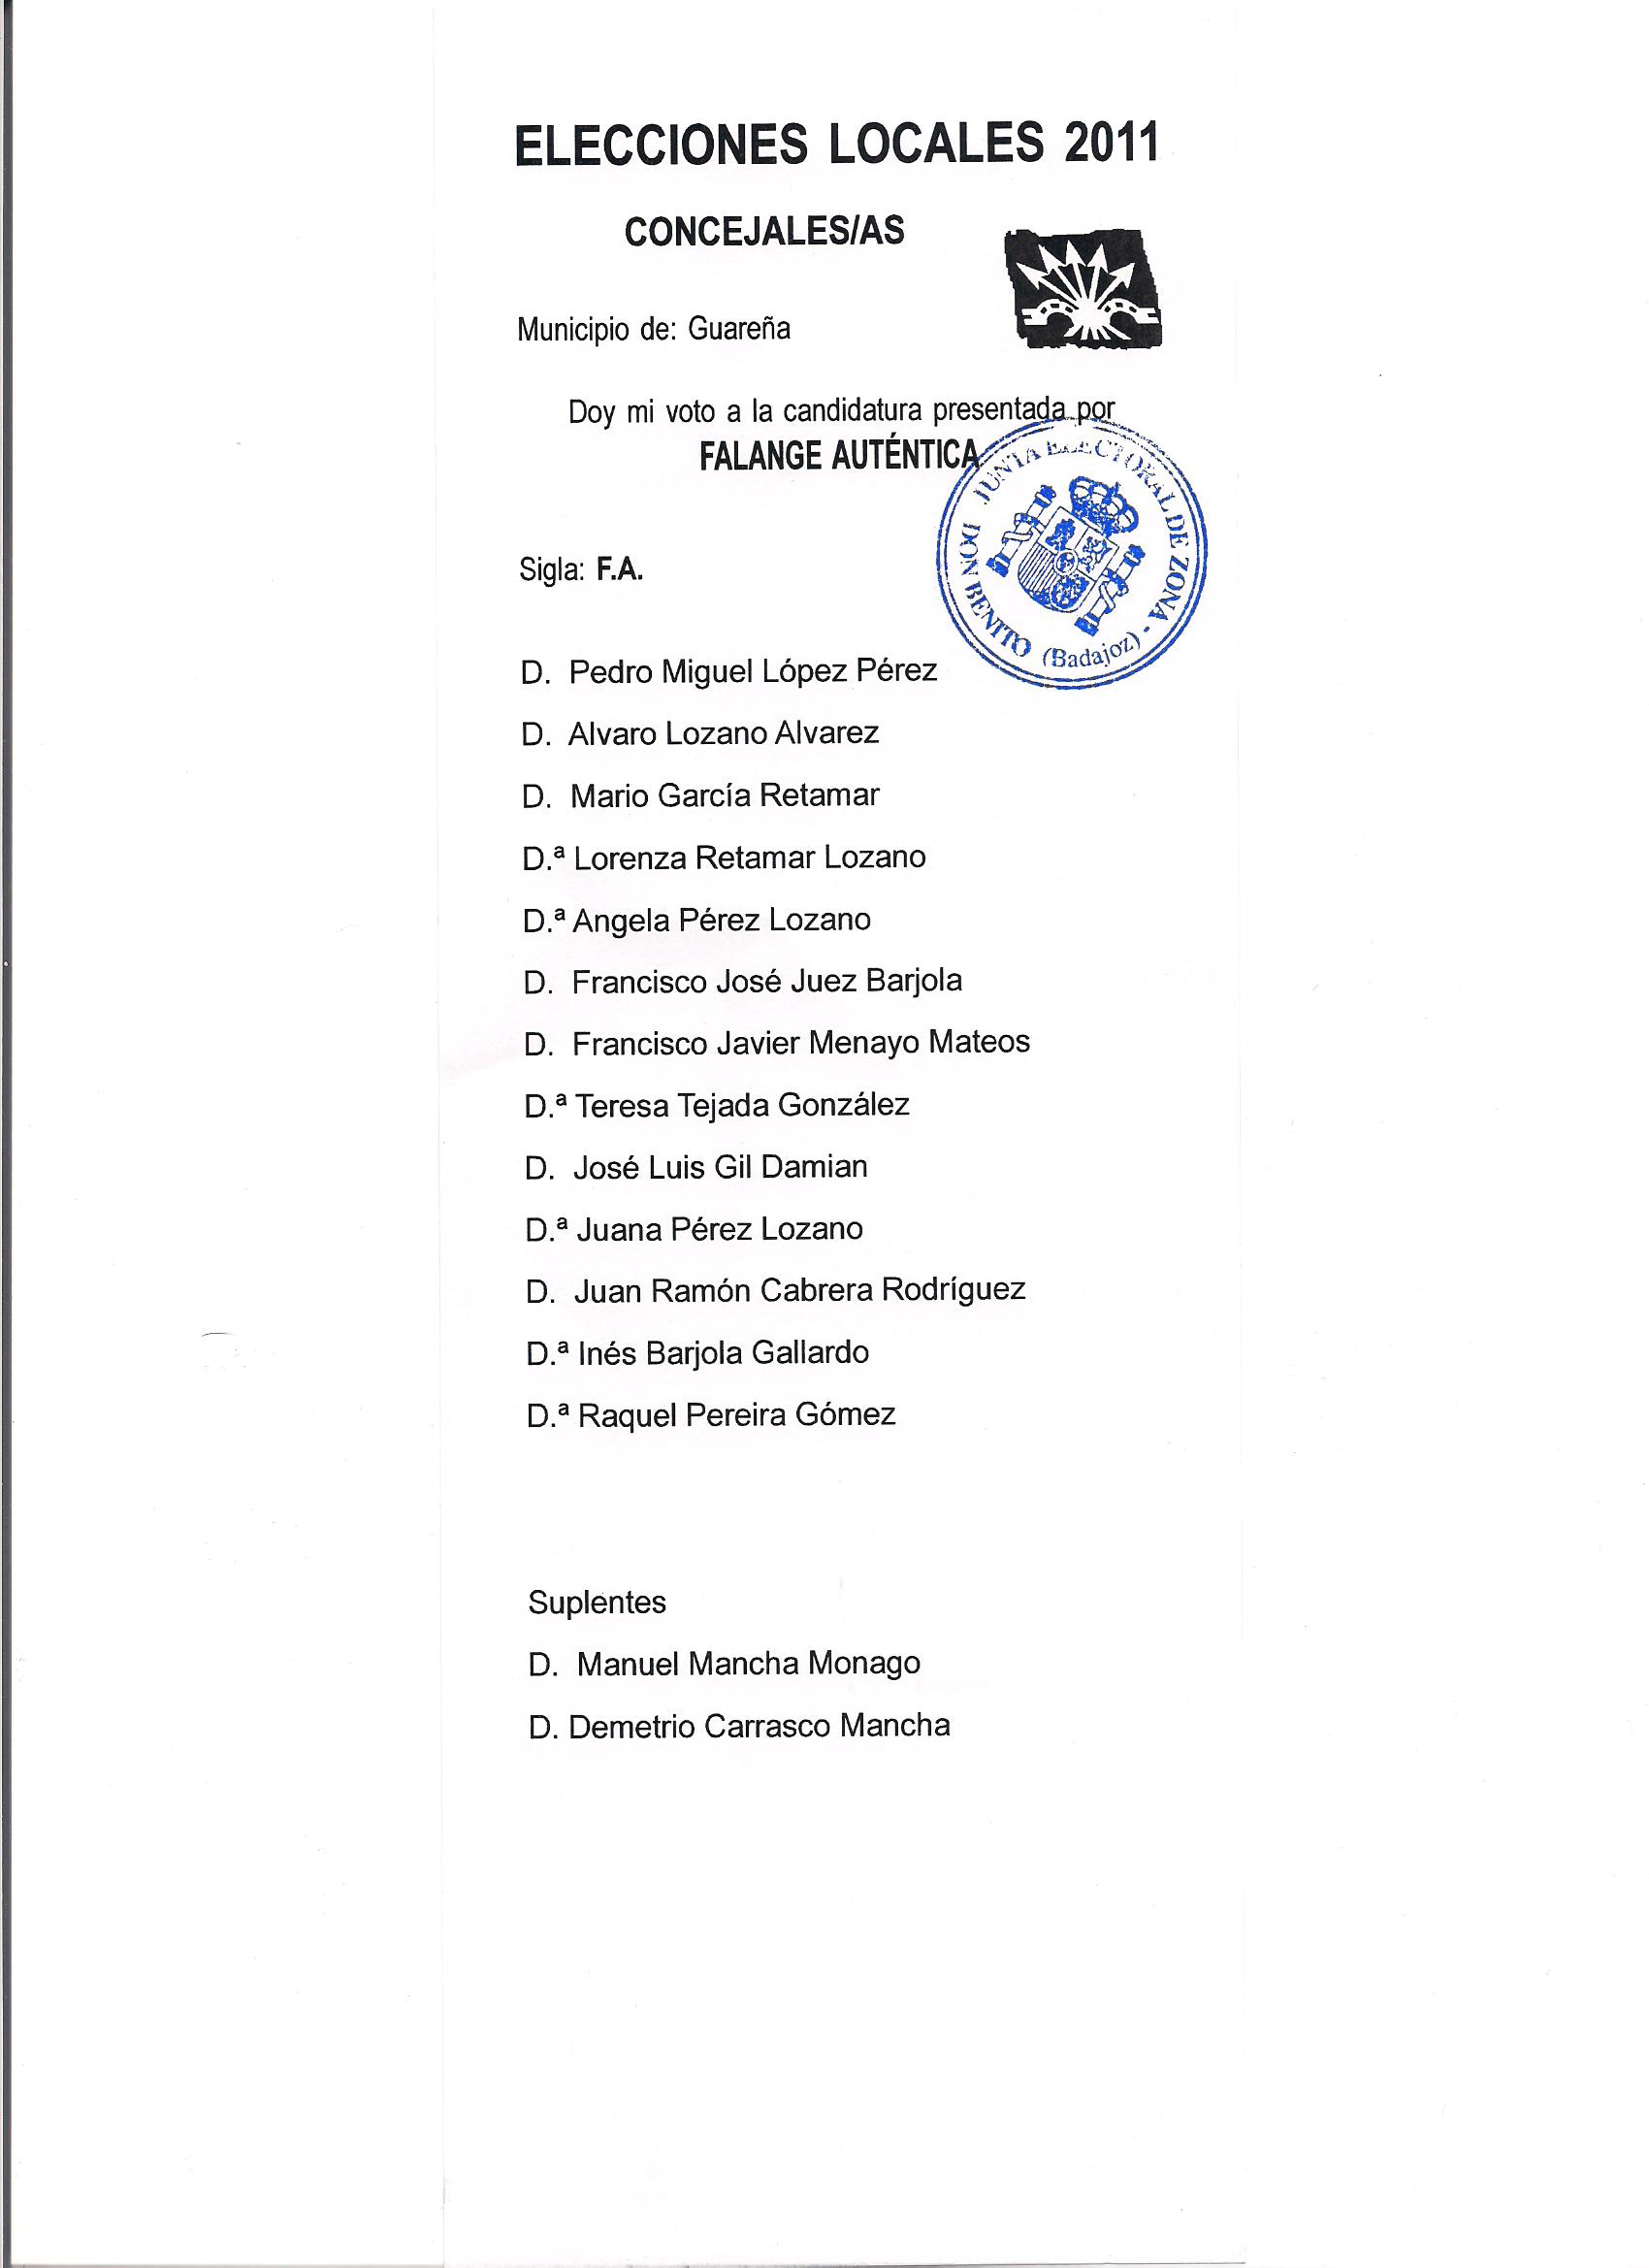 Listas de Falange Auténtica en Guareña a las Municipales de 2011